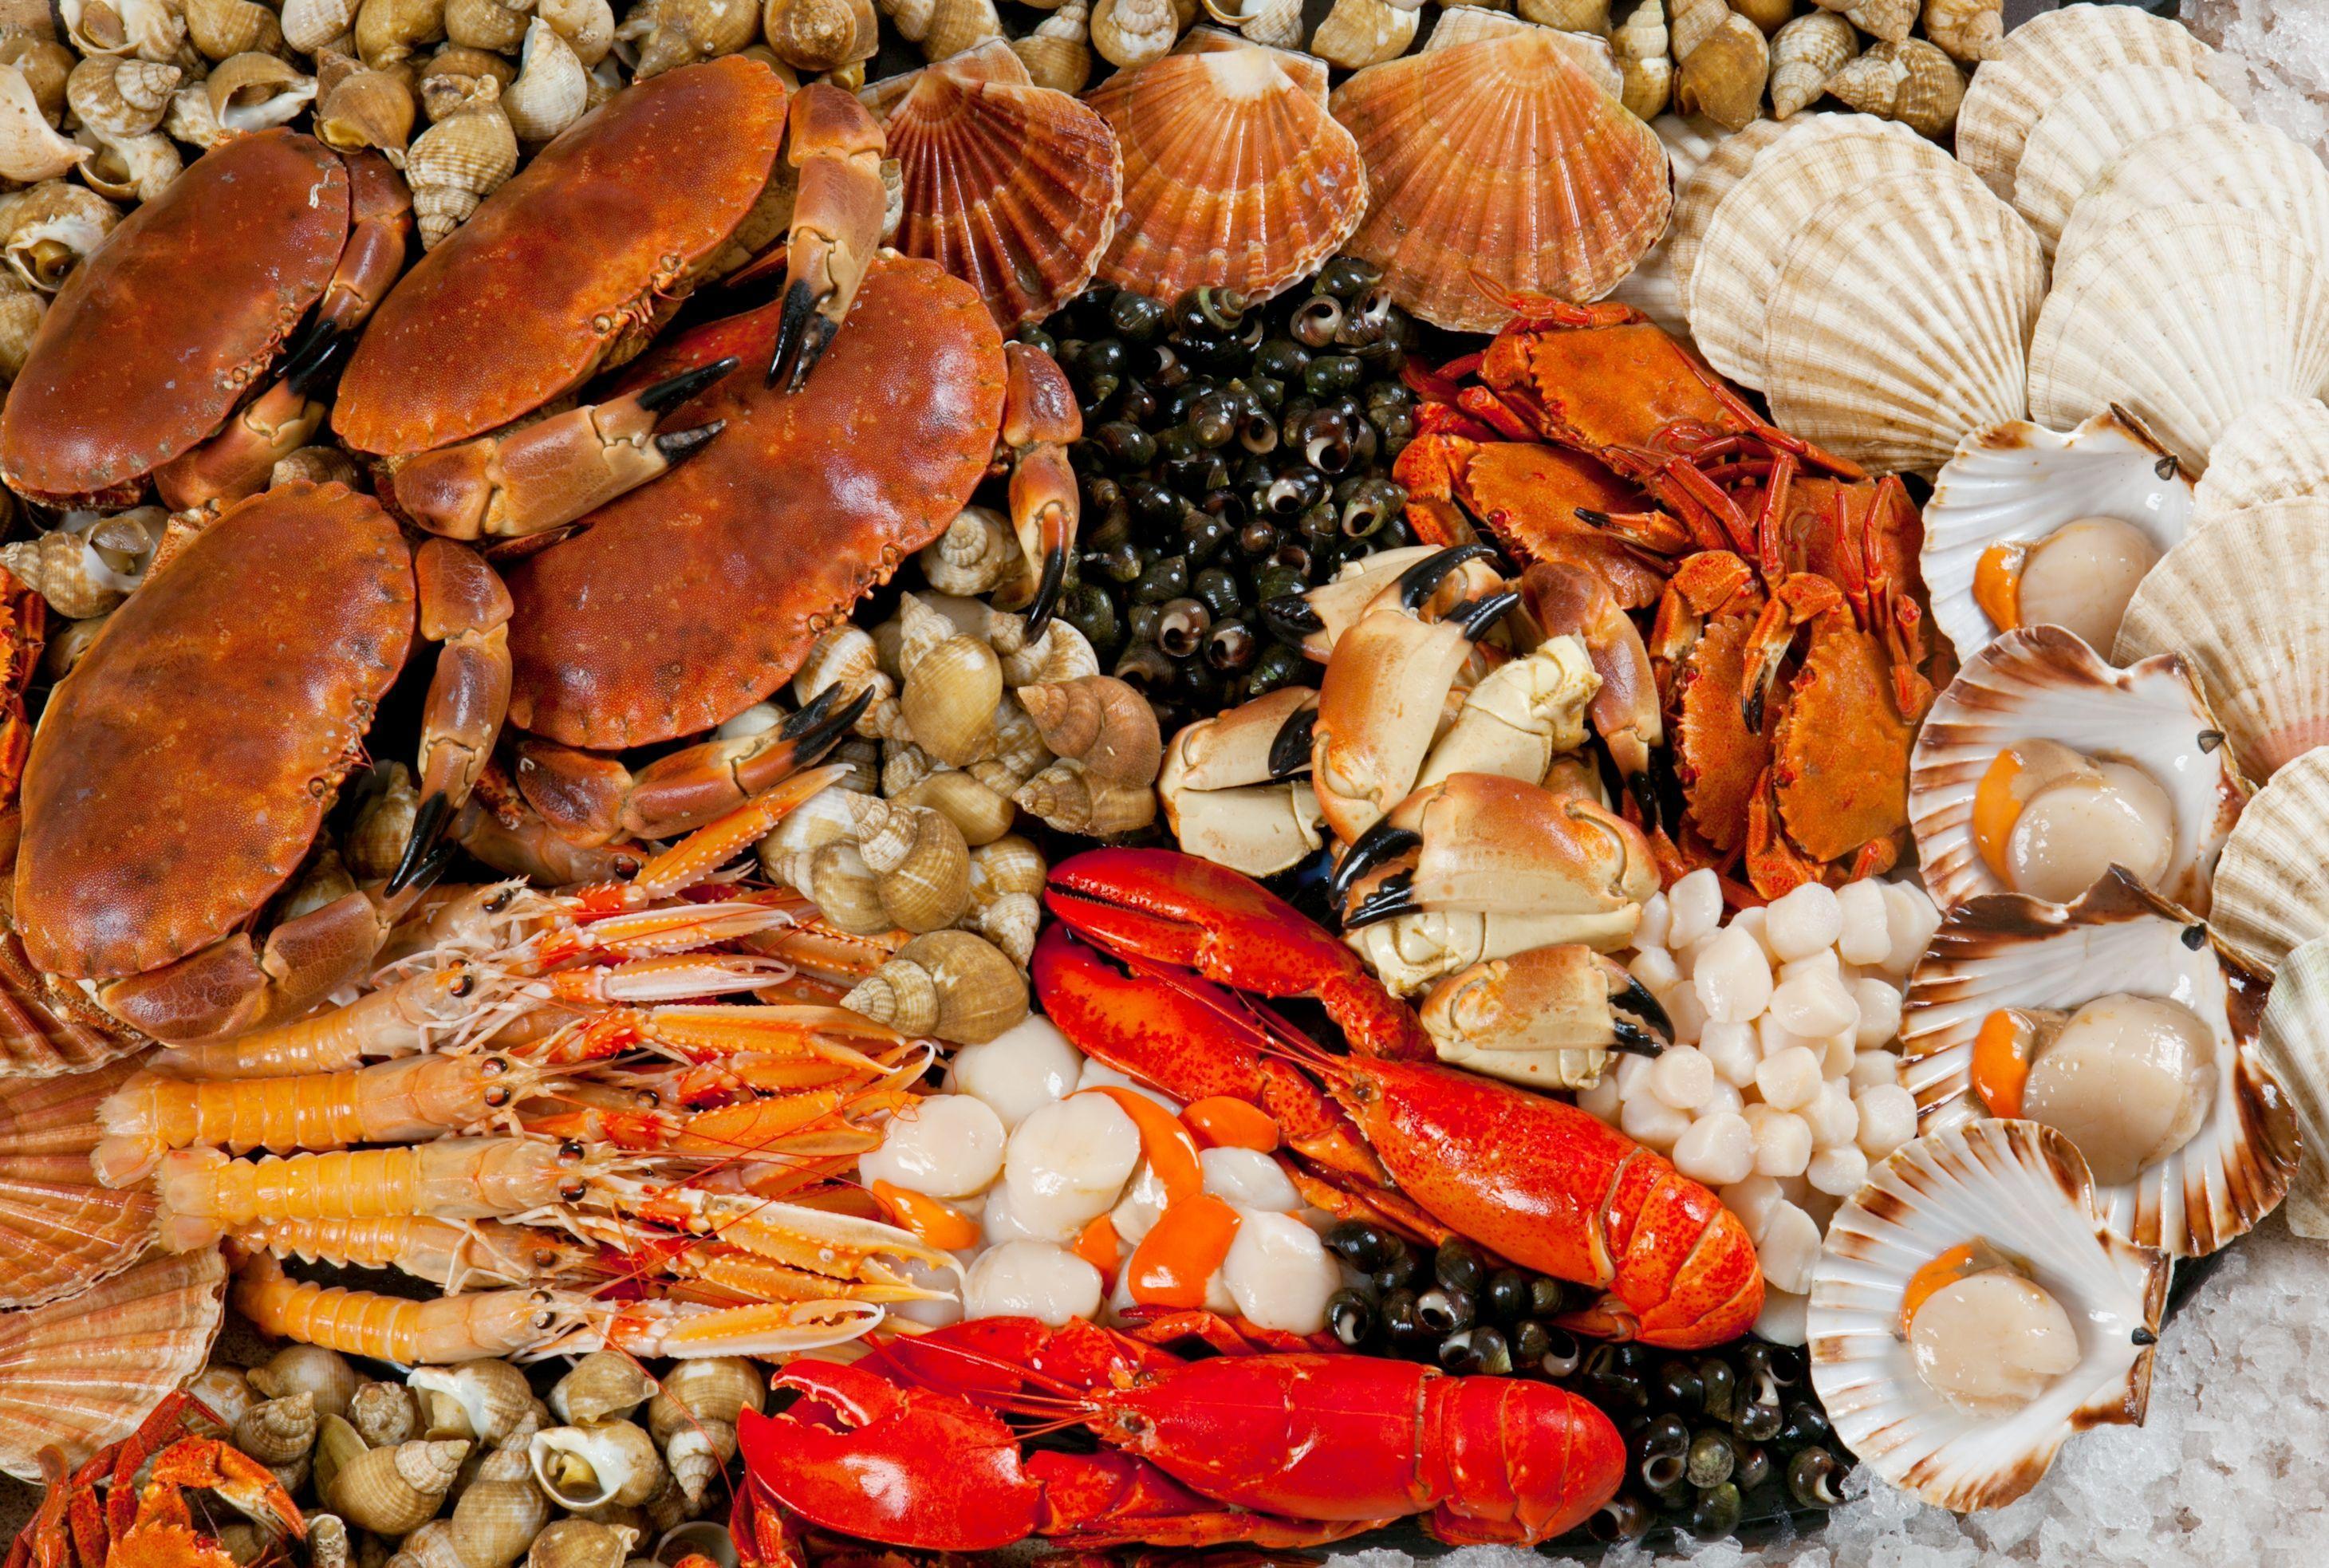 6048x4032px Seafood 11767.4 KB #323519